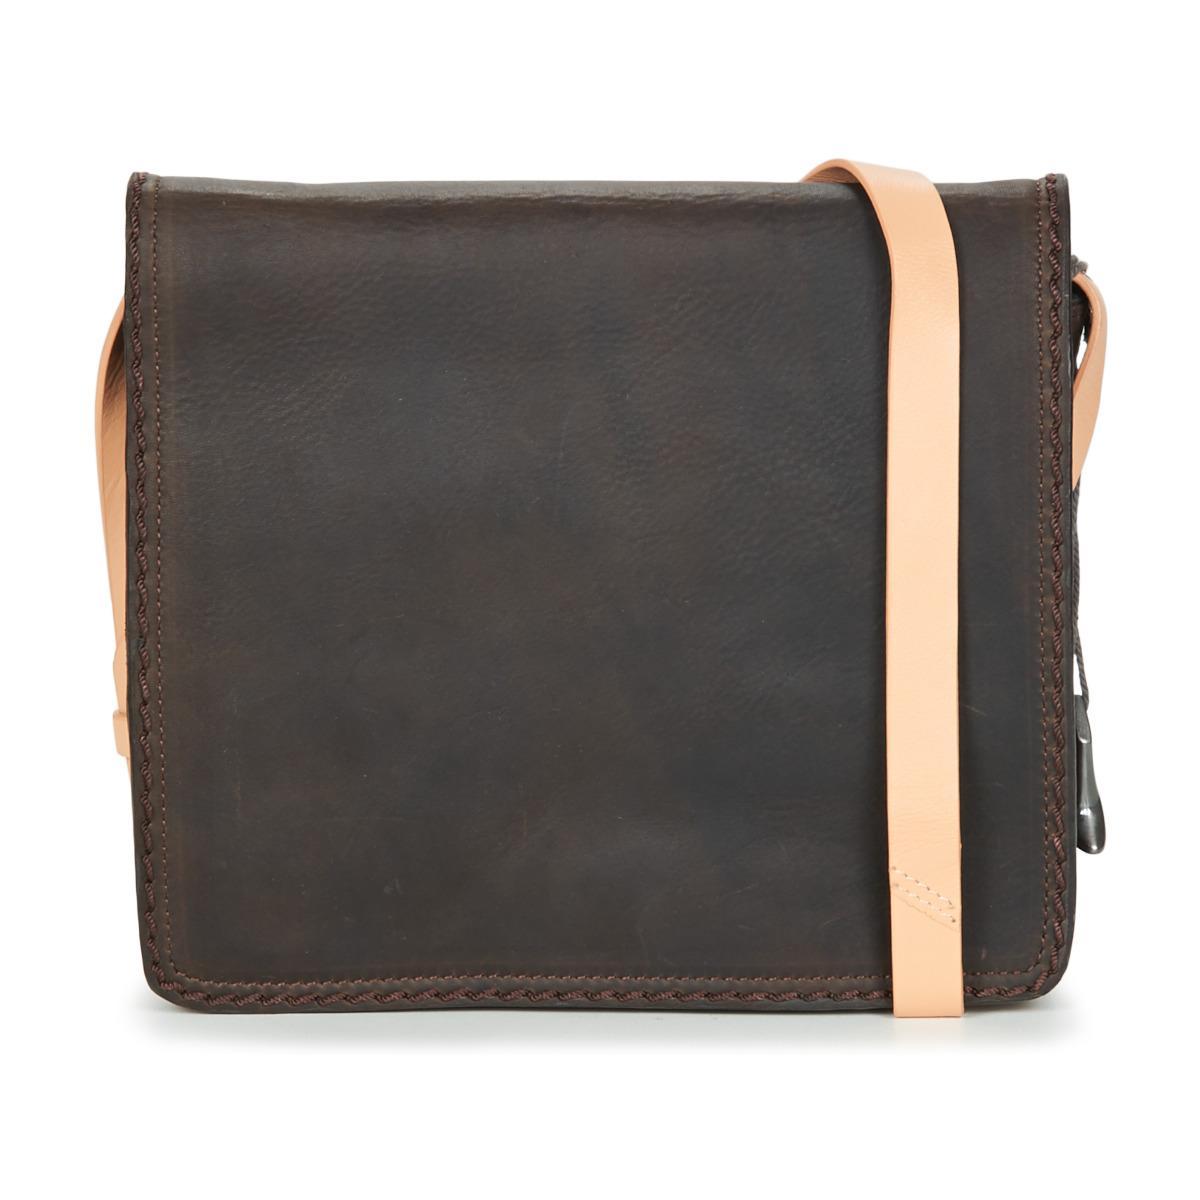 Clarks Teddington Way Shoulder Bag in Brown - Lyst 8efc88252a5e1